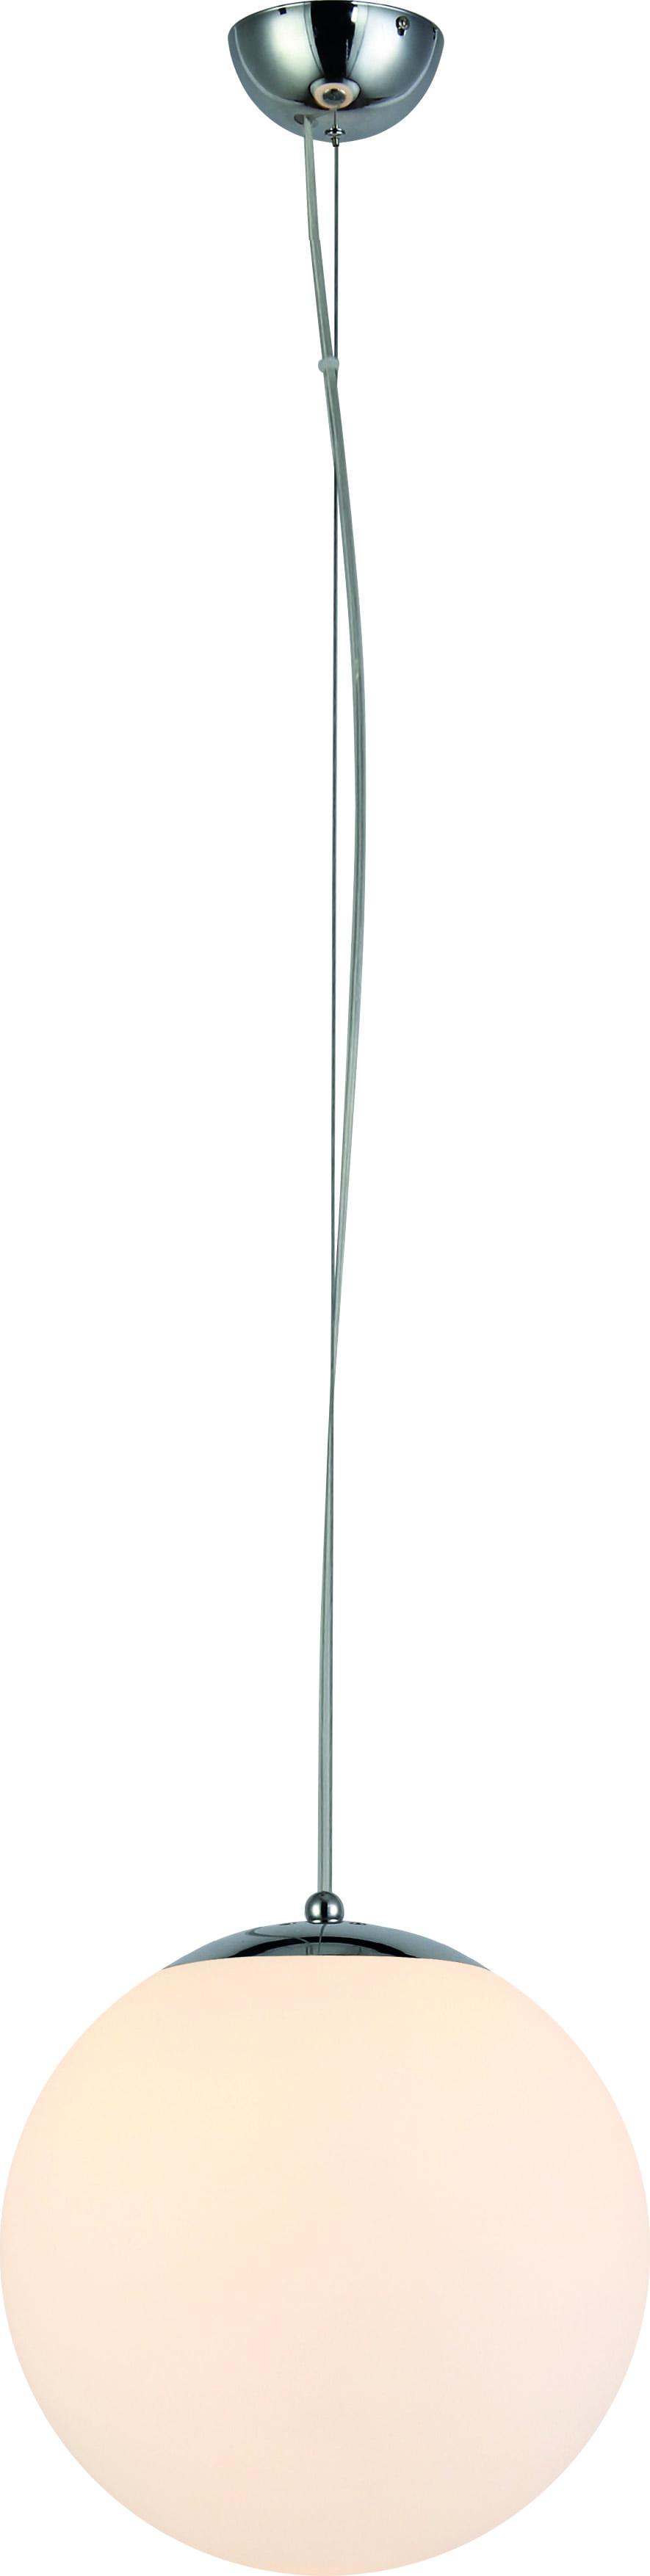 Hanging lamp with white glass shade KULA Emil 30 cm